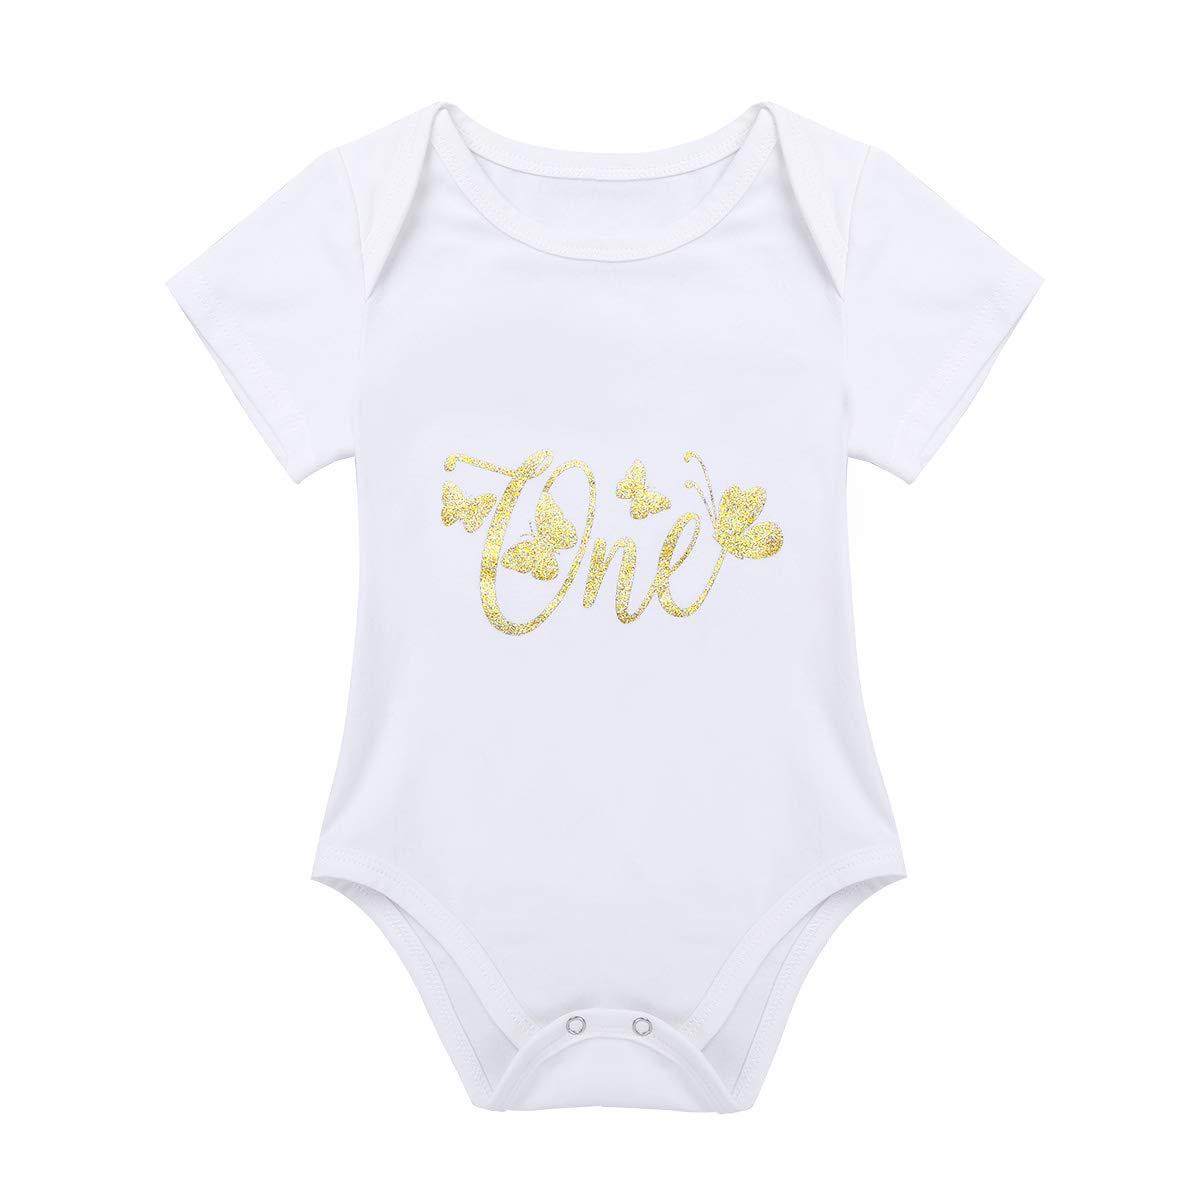 TiaoBug 3pcs Infant Baby Girls 1st Birthday Clothes Set Short Sleeves Romper+Tutu Skirt+Headband